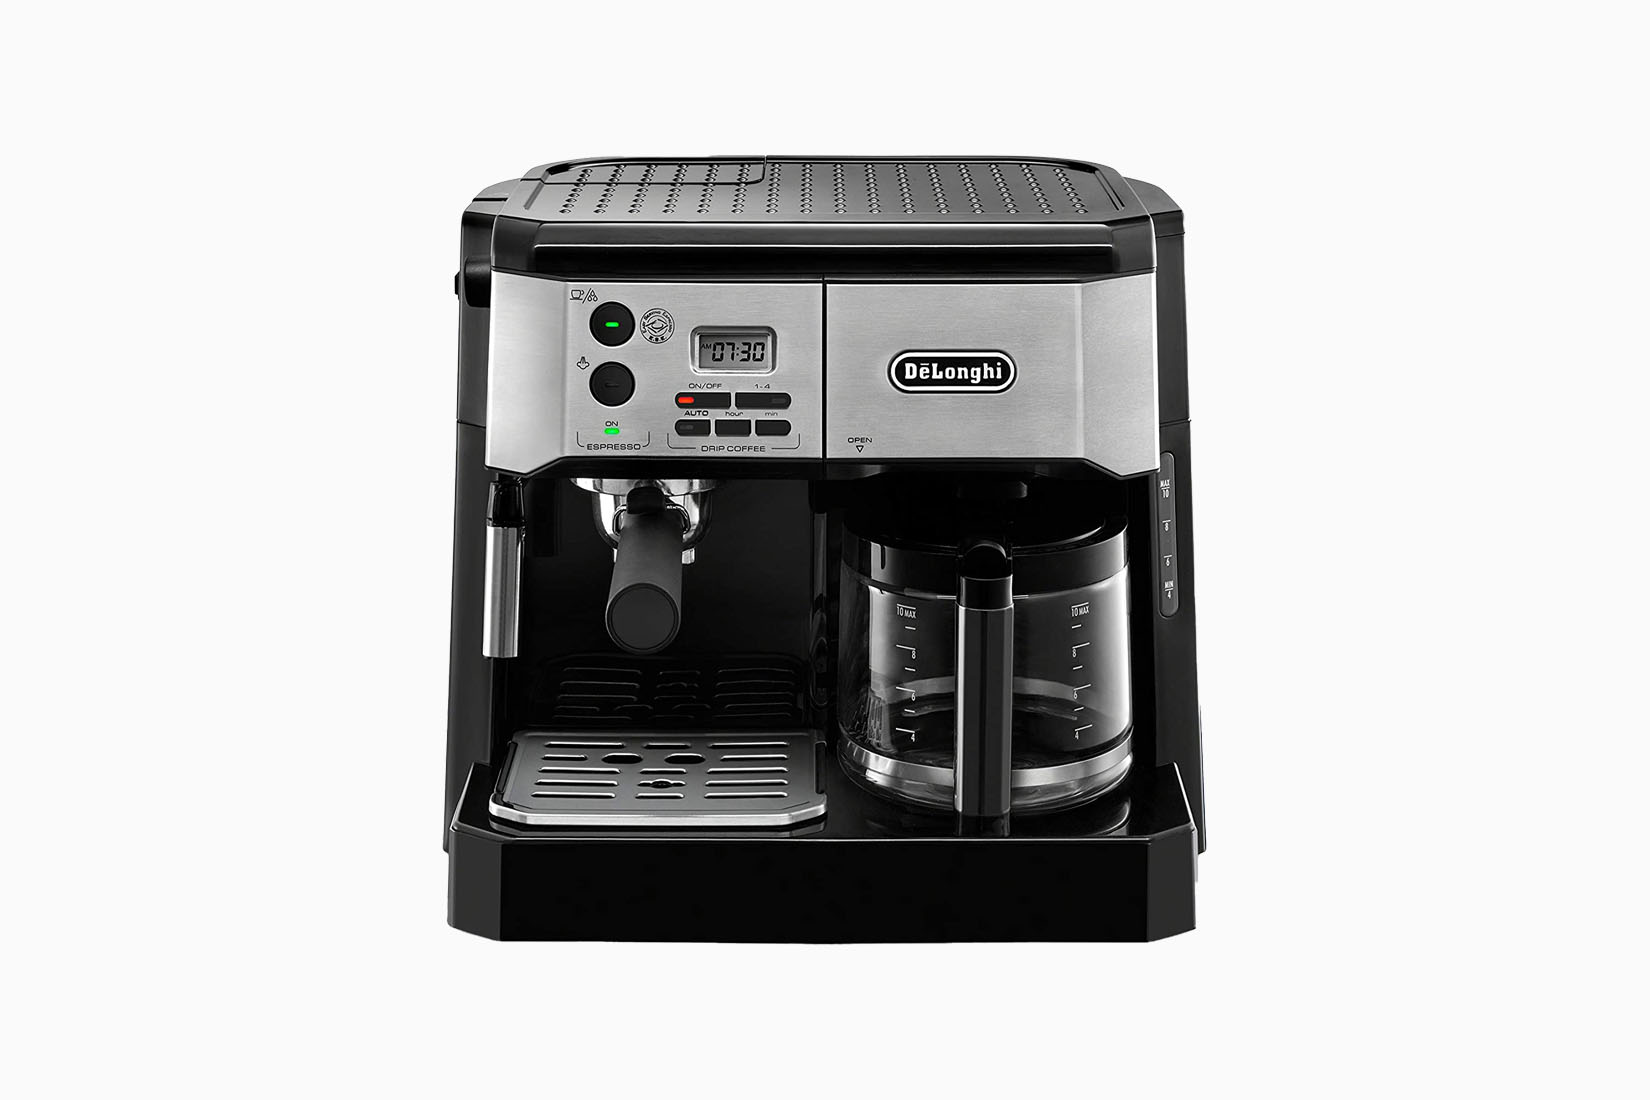 best drip coffee makers de longhi review Luxe Digital